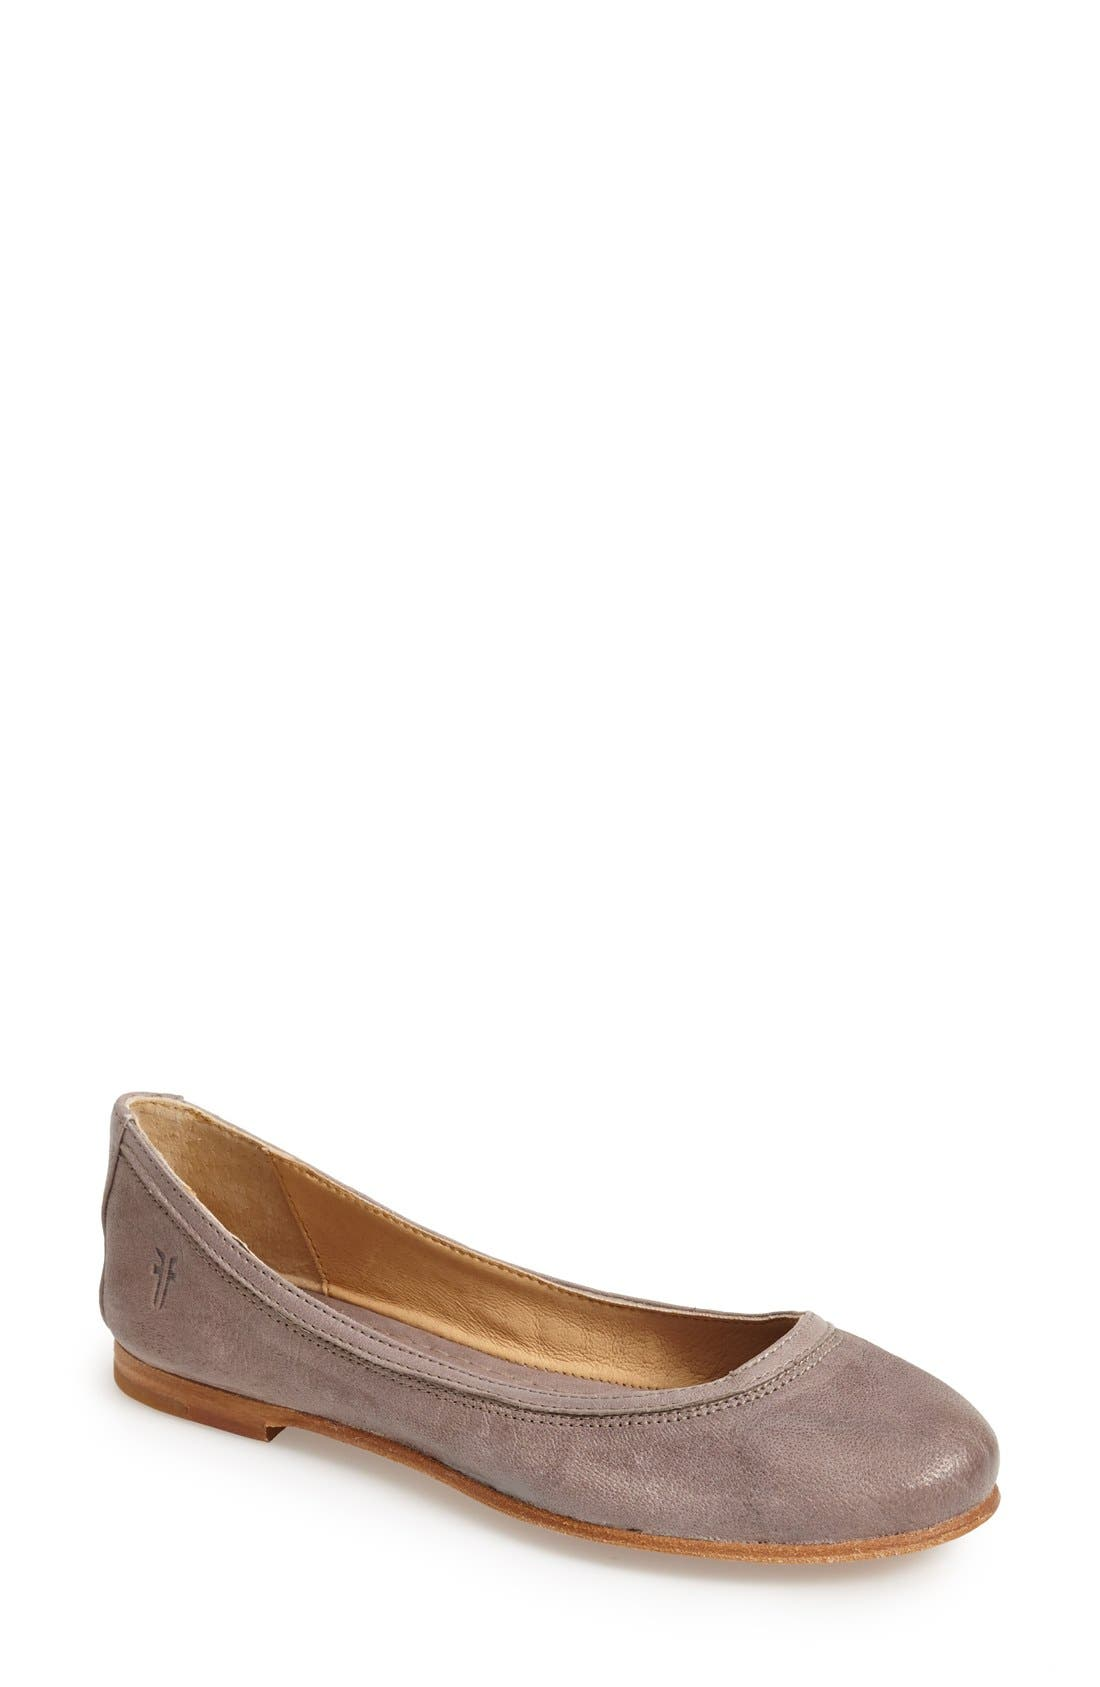 b1cd7397f4470 Frye Women s Shoes